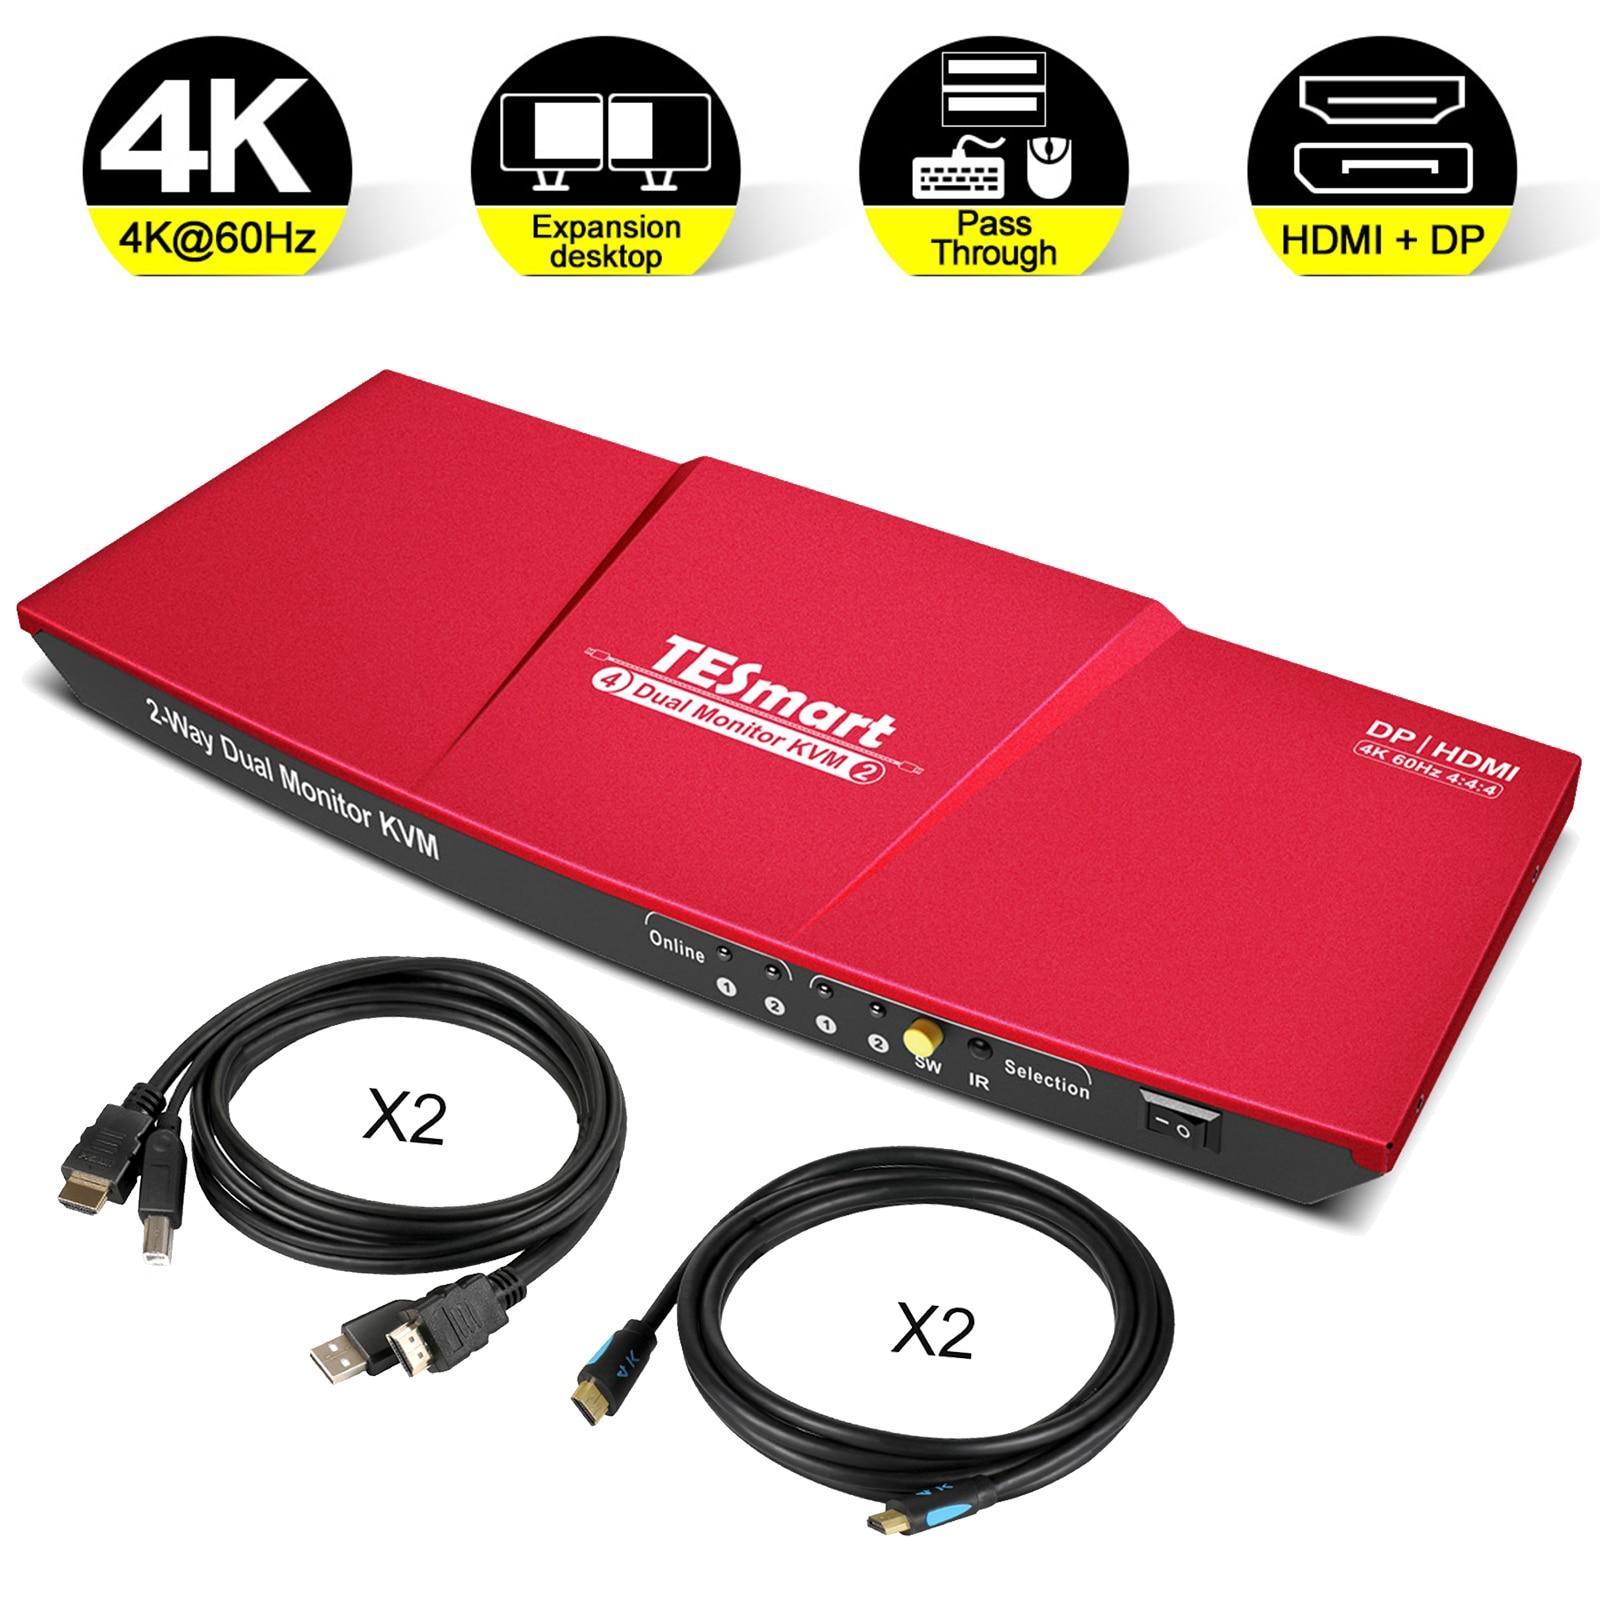 TESmart KVM Switch 2x2 DP+HDMI Dual Monitor KVM 4K@60Hz 4:4:4